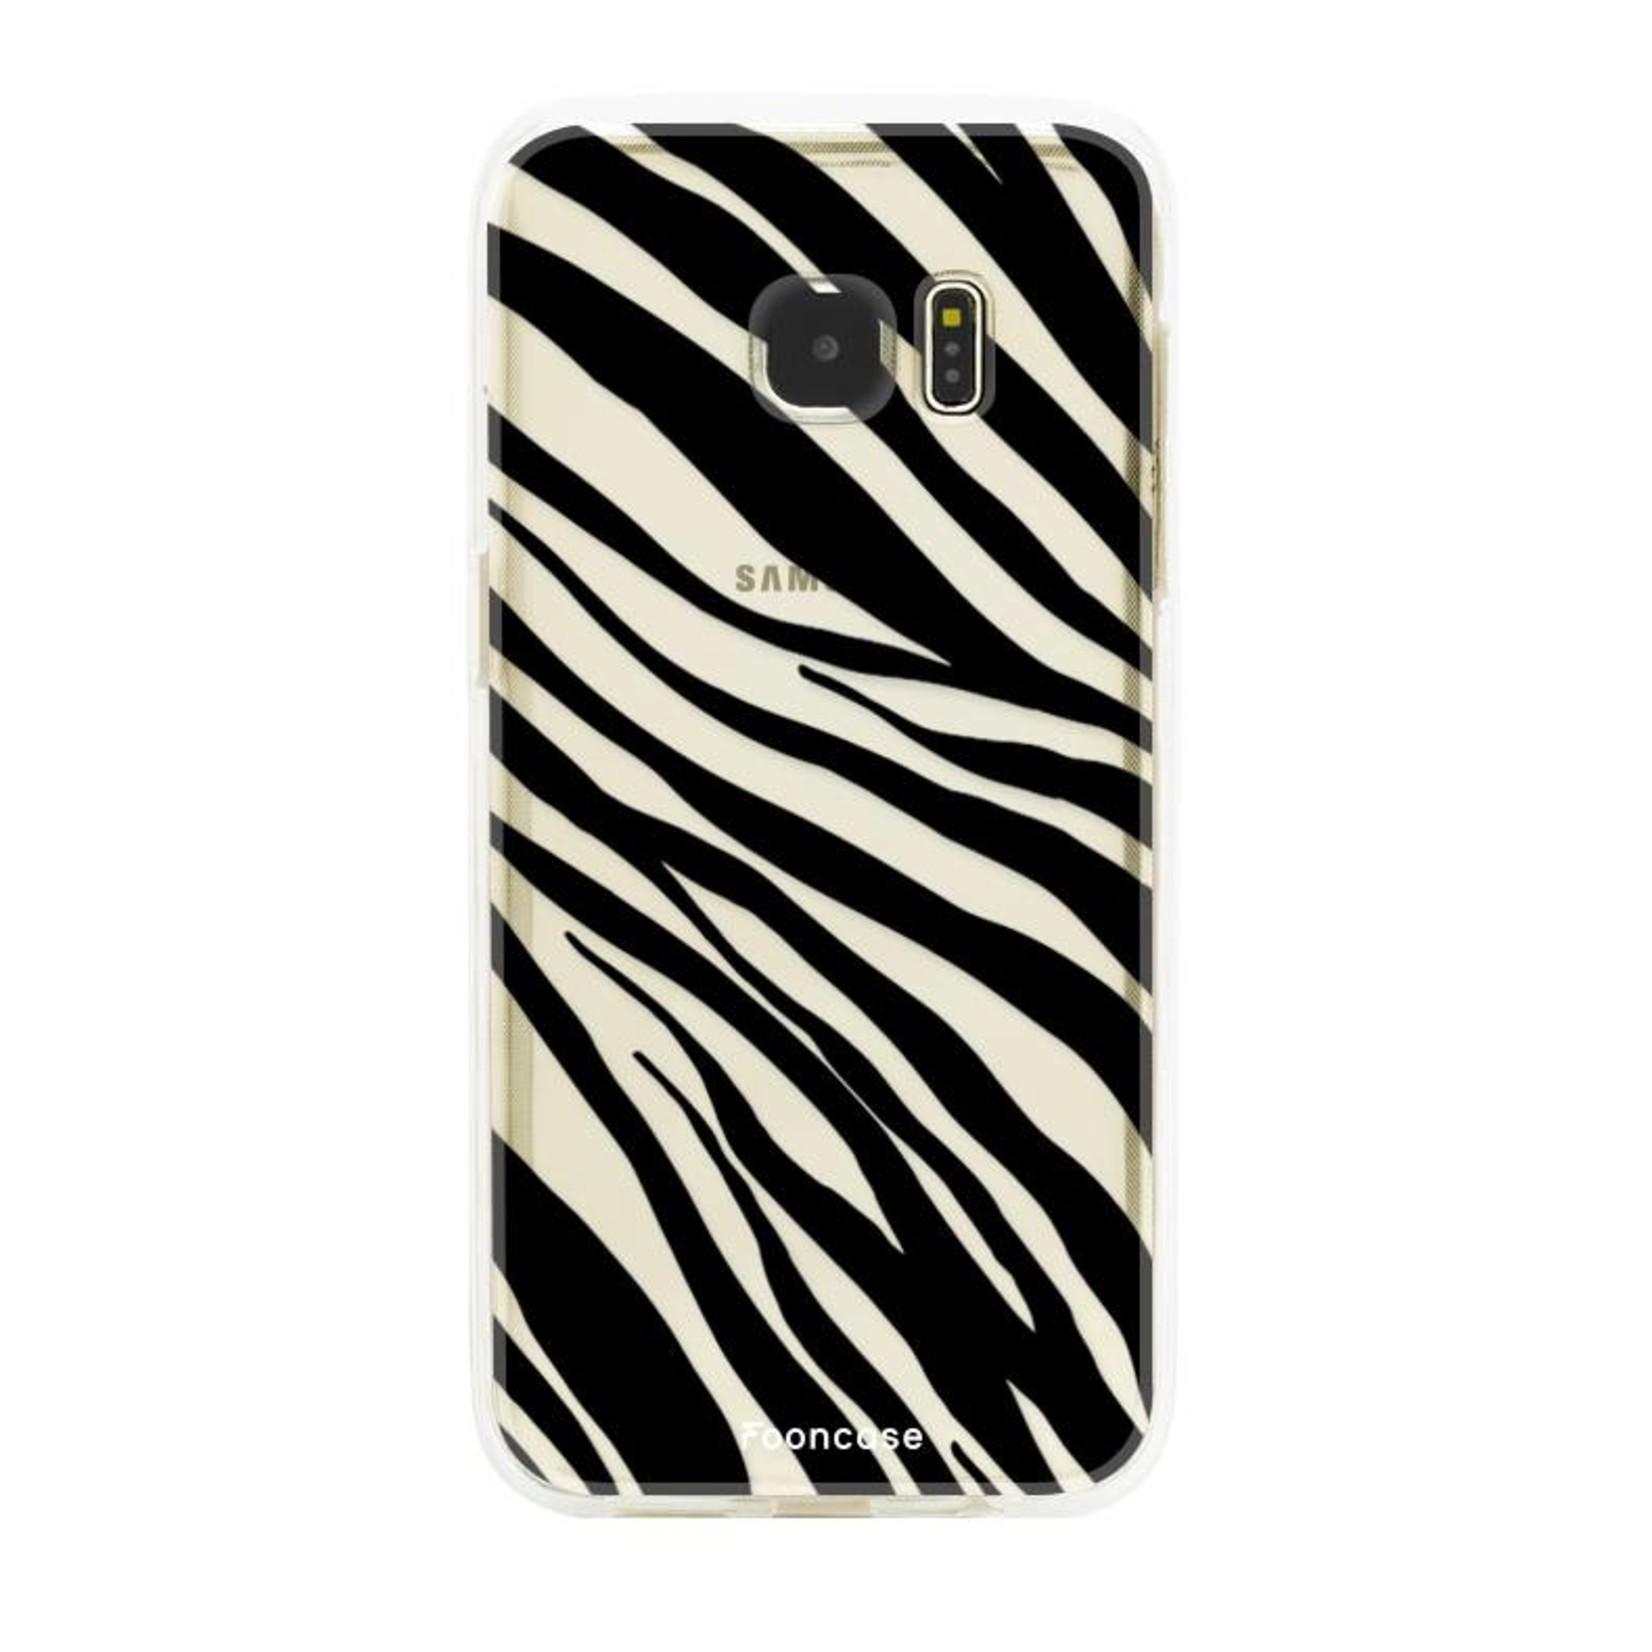 FOONCASE Samsung Galaxy S7 Edge hoesje TPU Soft Case - Back Cover - Zebra print